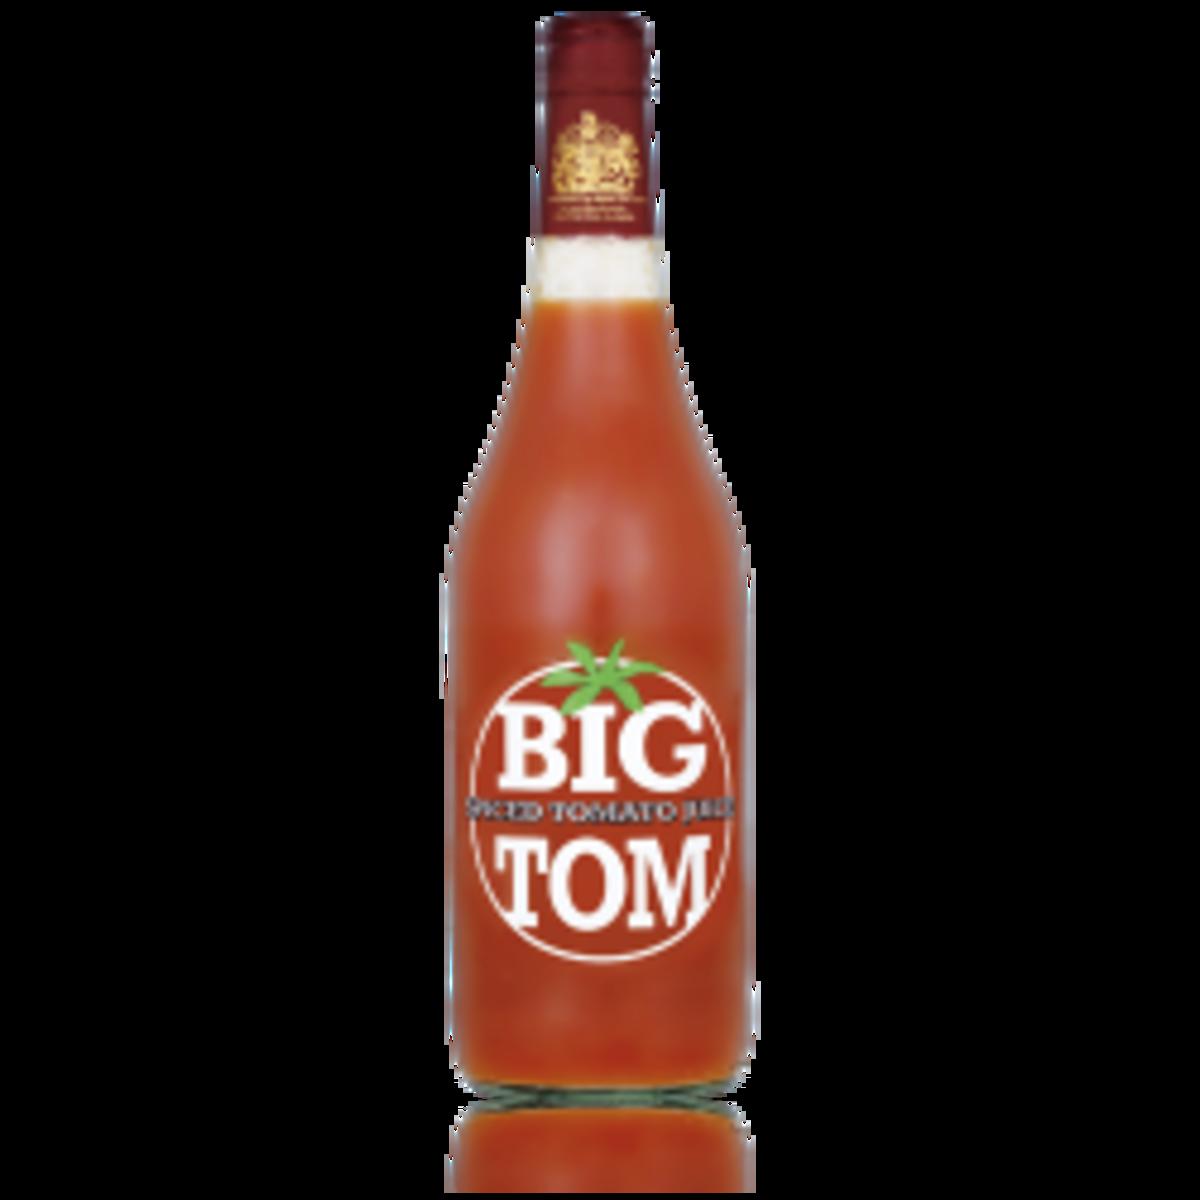 'Big Tom' Tomato juice; a favourite of Queen Elizabeth II